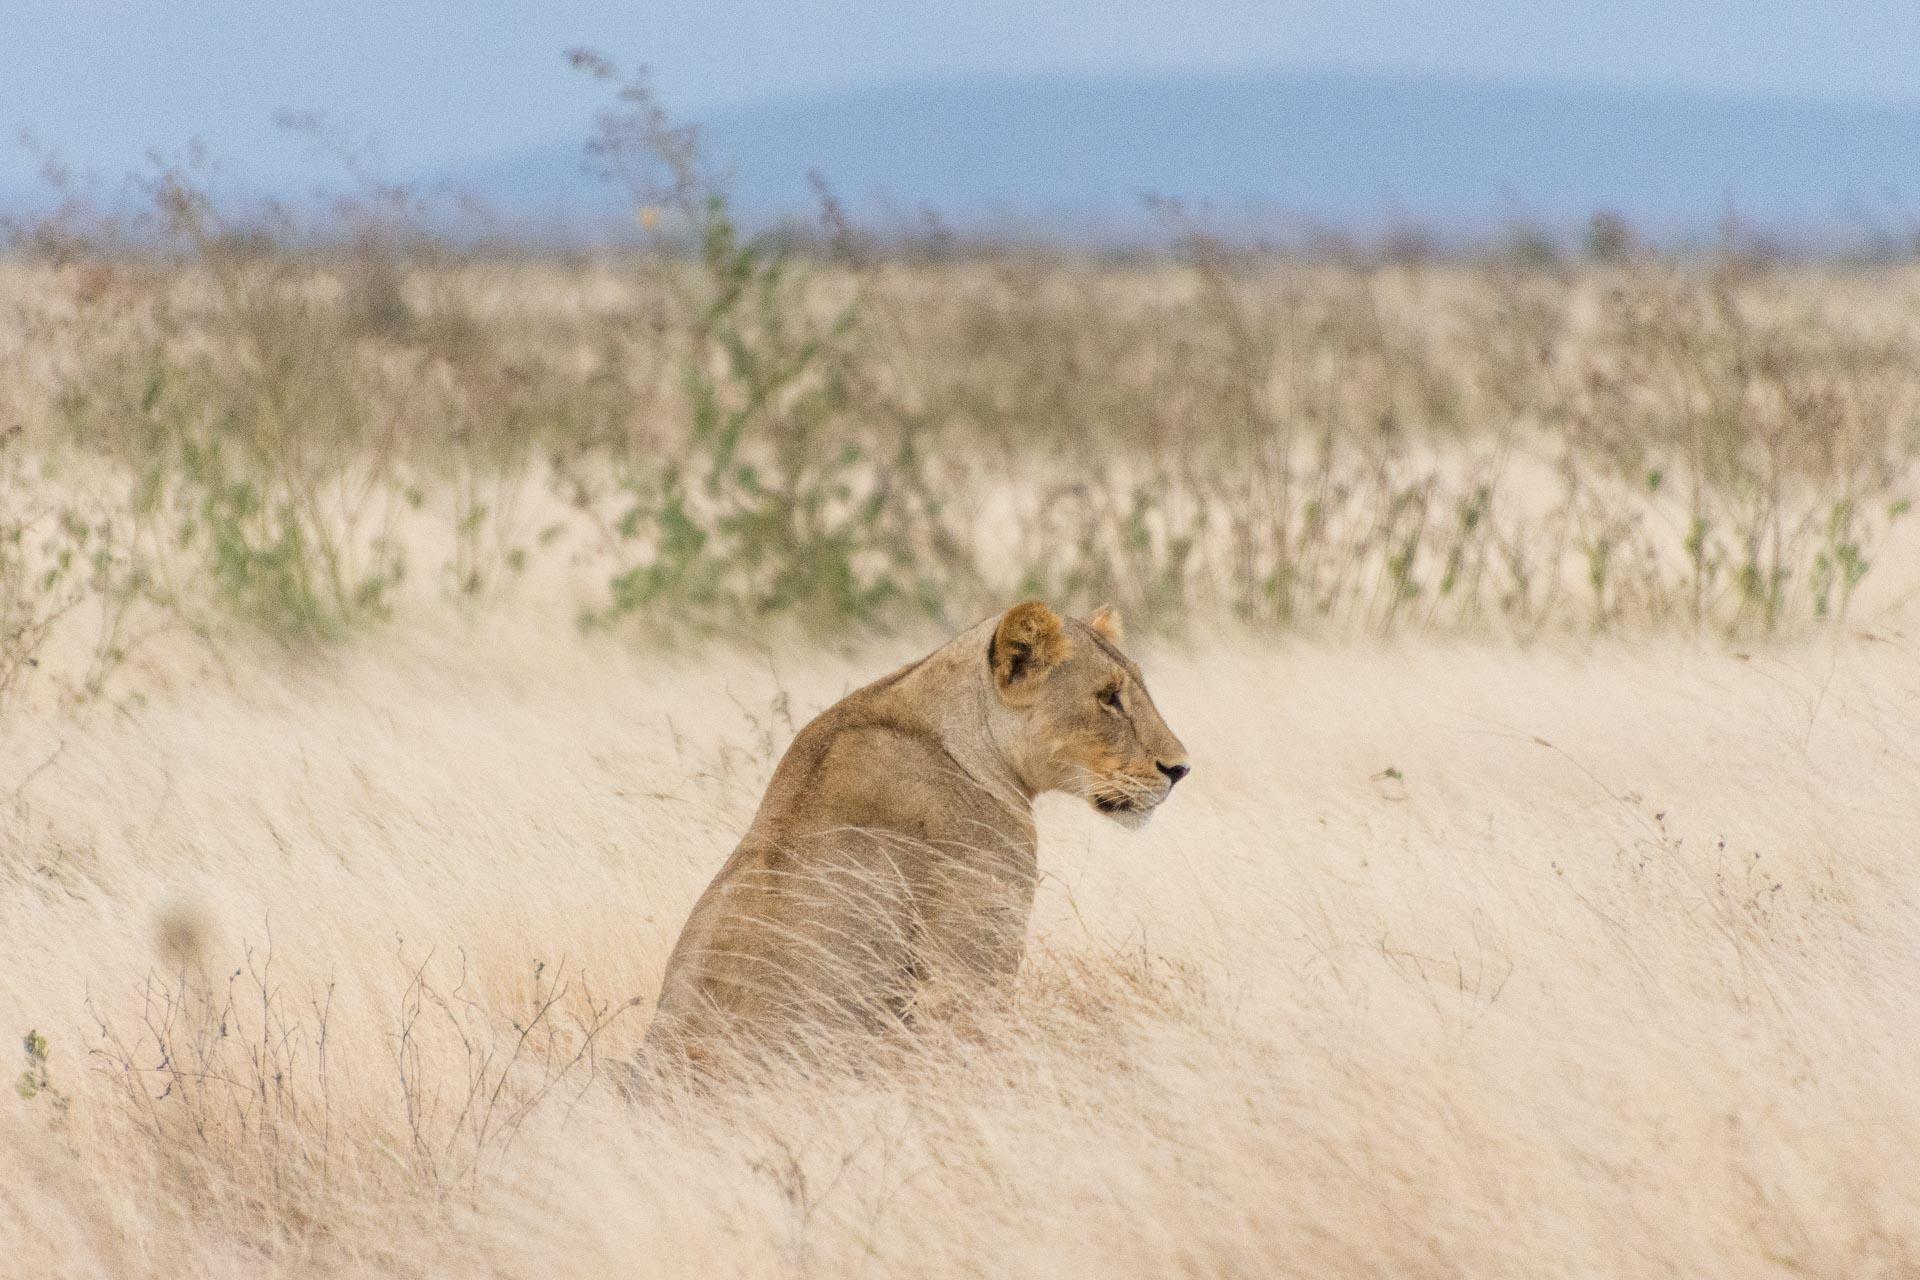 Loewen-Tsavo-Nationalpark-Kenia-Globetrotter-Select-1